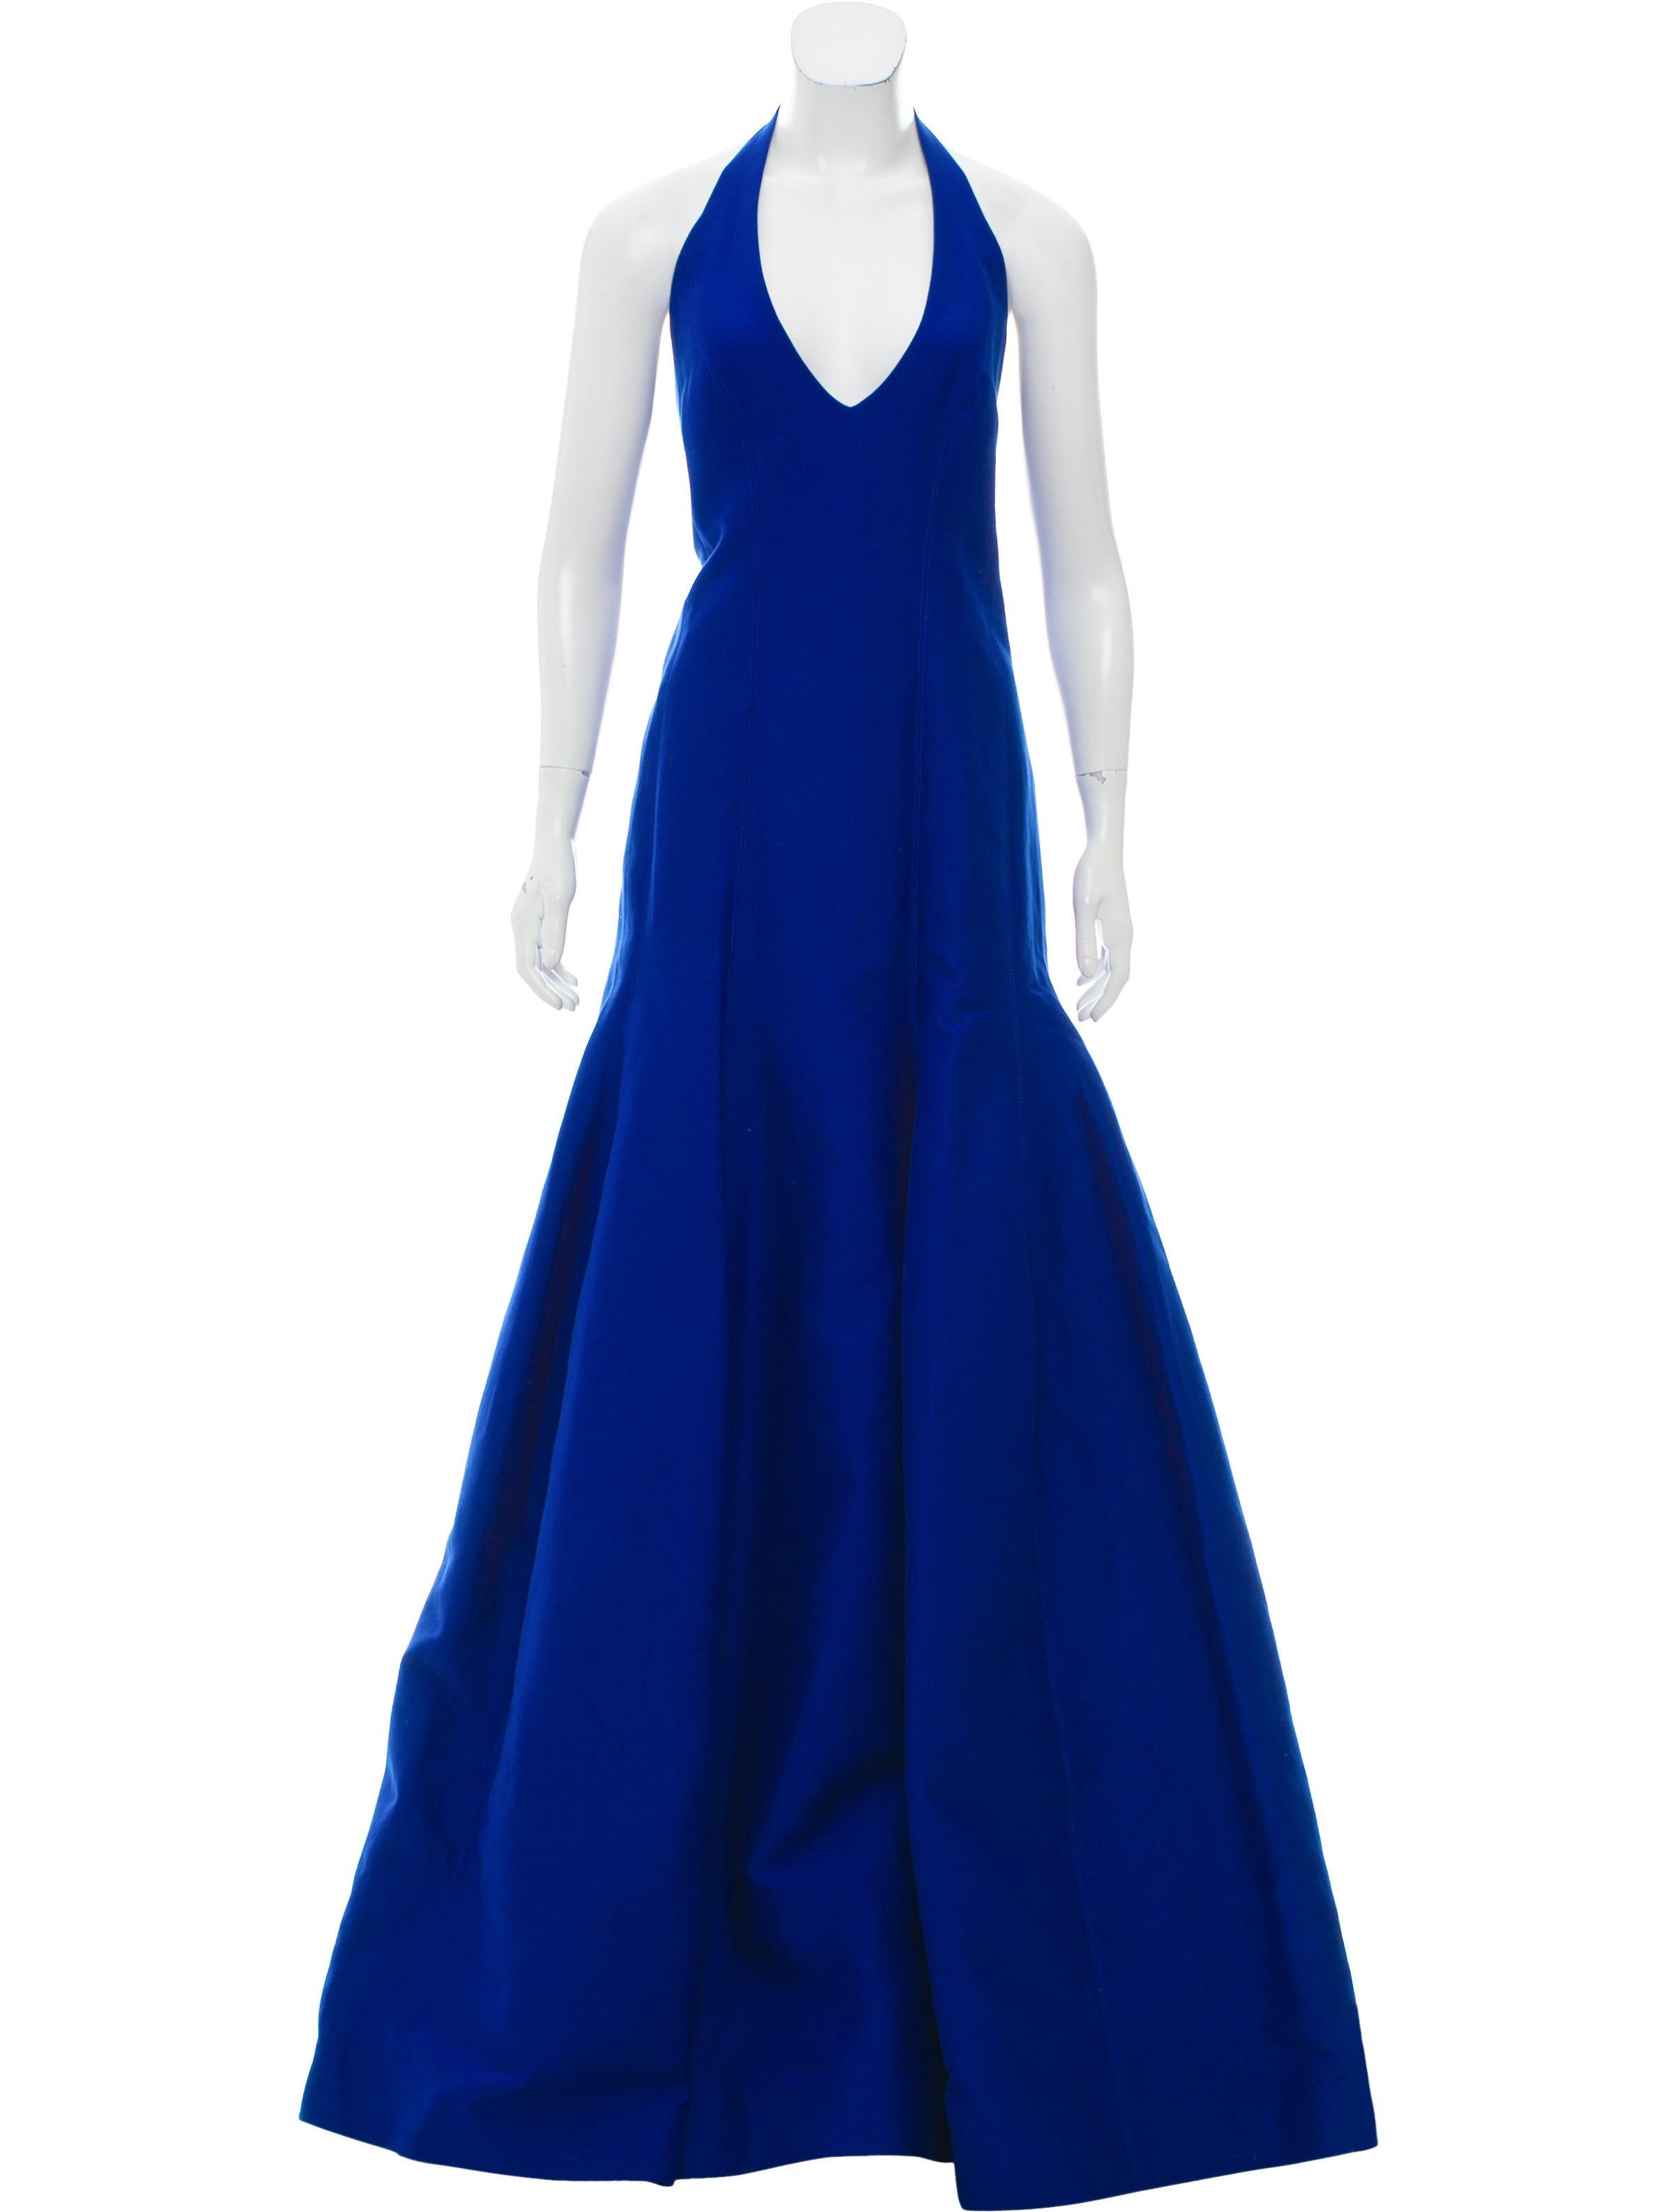 Halston Heritage Sleeveless Evening Dress w/ Tags - Clothing ...